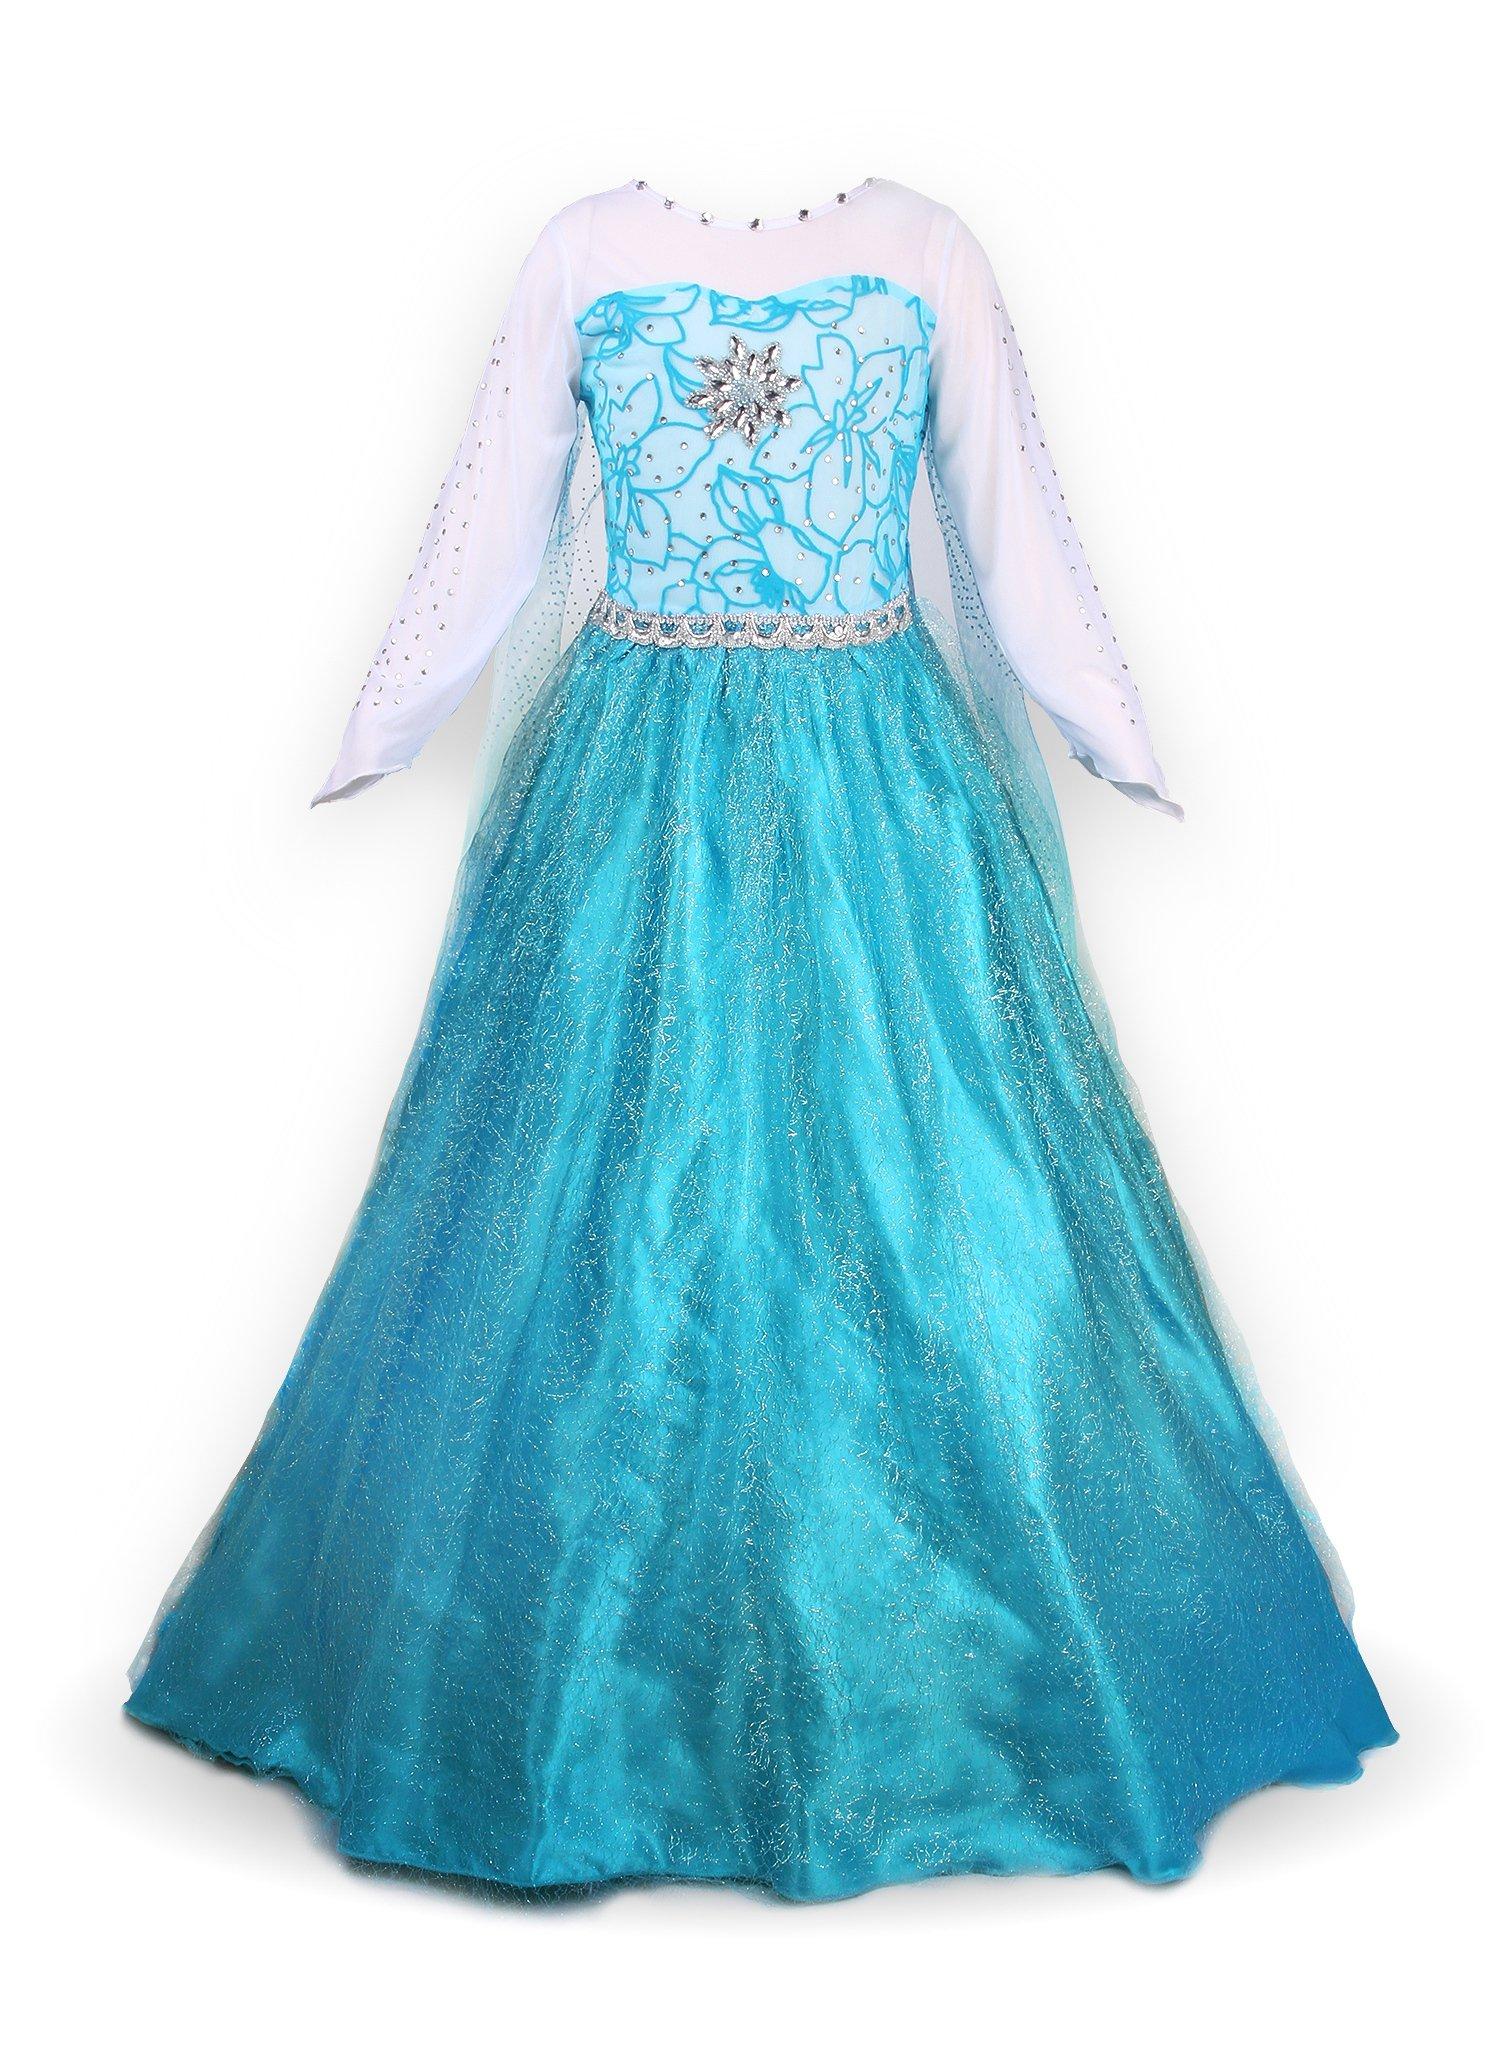 ReliBeauty Petites Filles Princesse Elsa Manches Longues Robe Costume product image